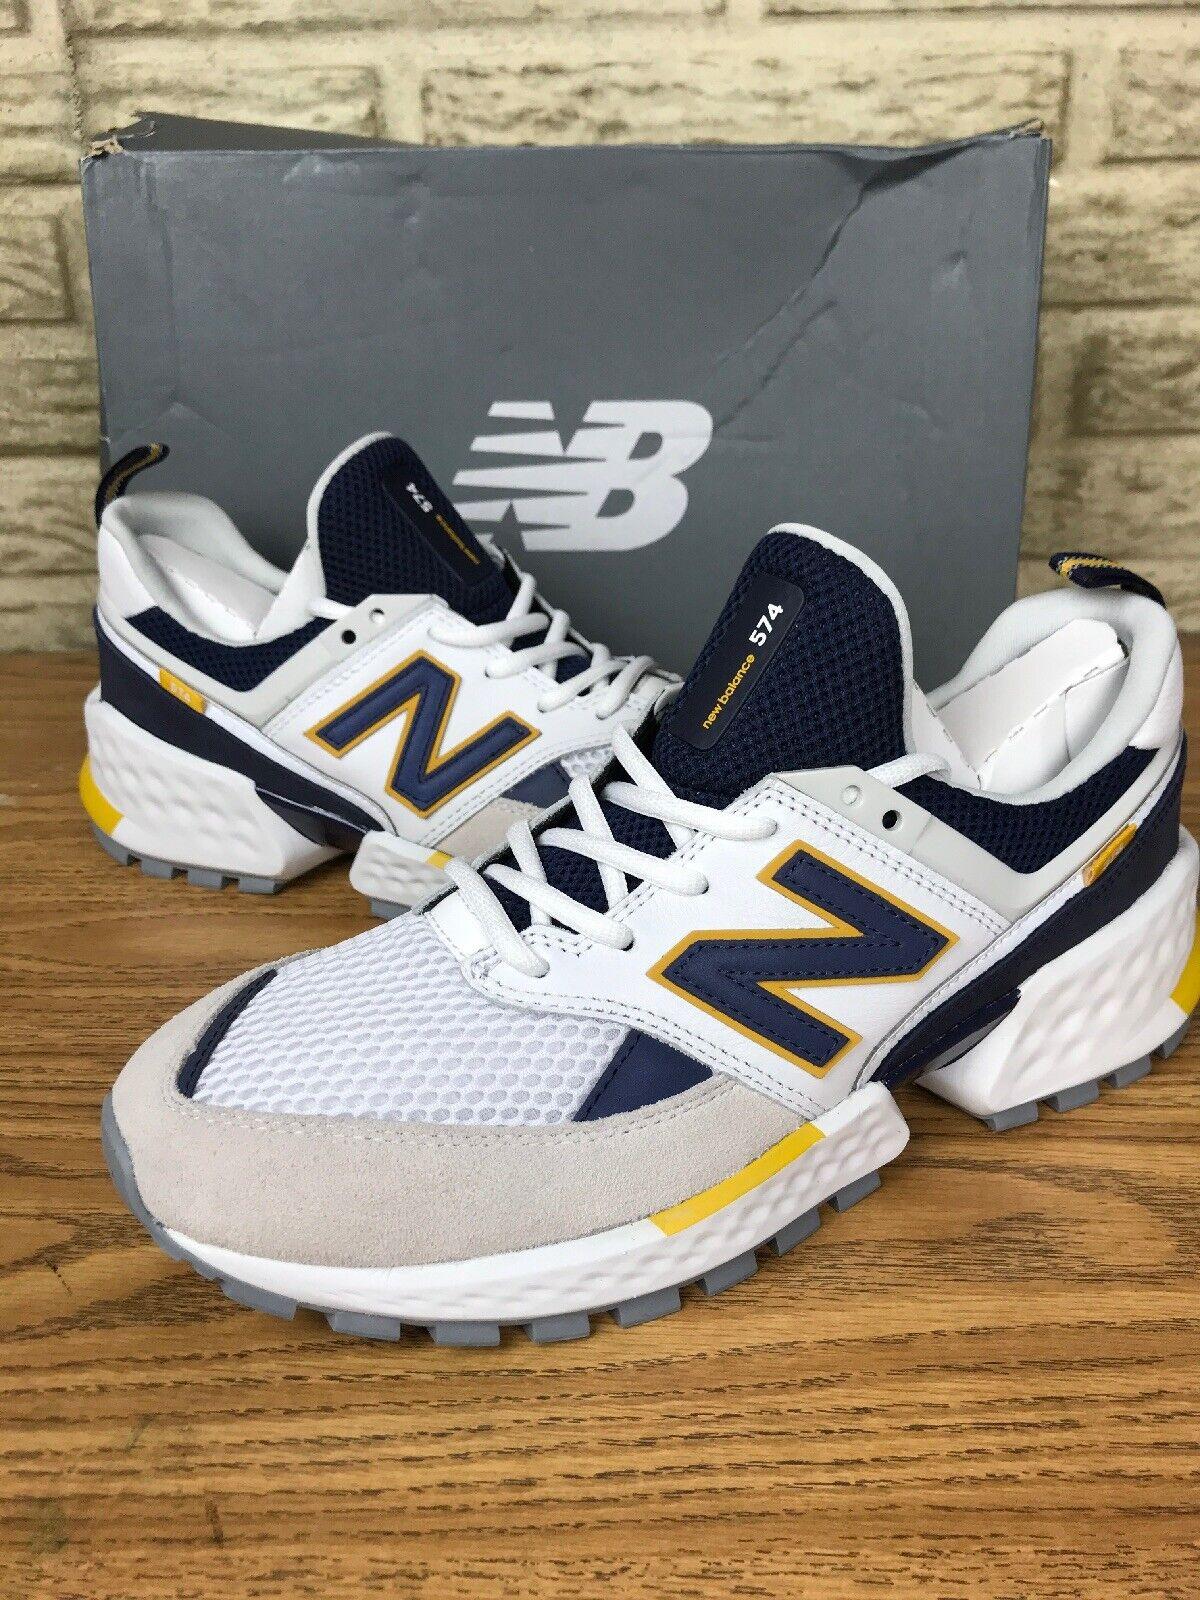 New Balance 574 Sport Lifestyle Running shoes White bluee (MS74EDD) Sz 9 D